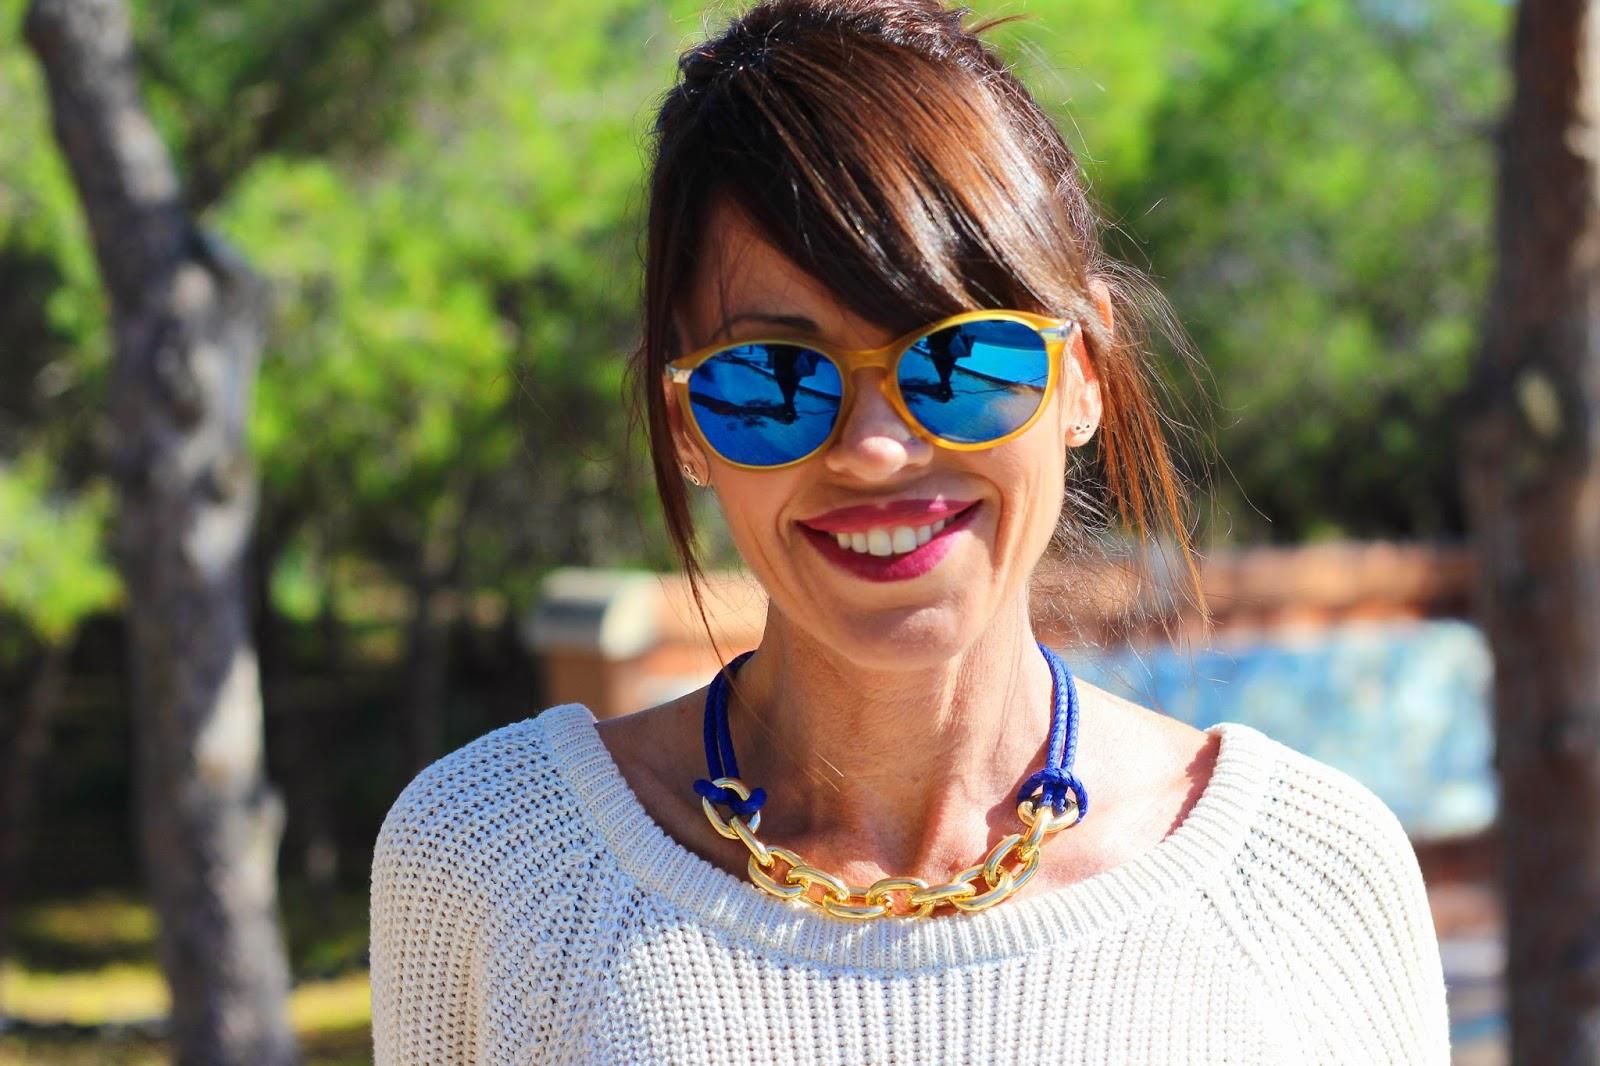 Gafas Life espejadas- Collar Cuchicuchi